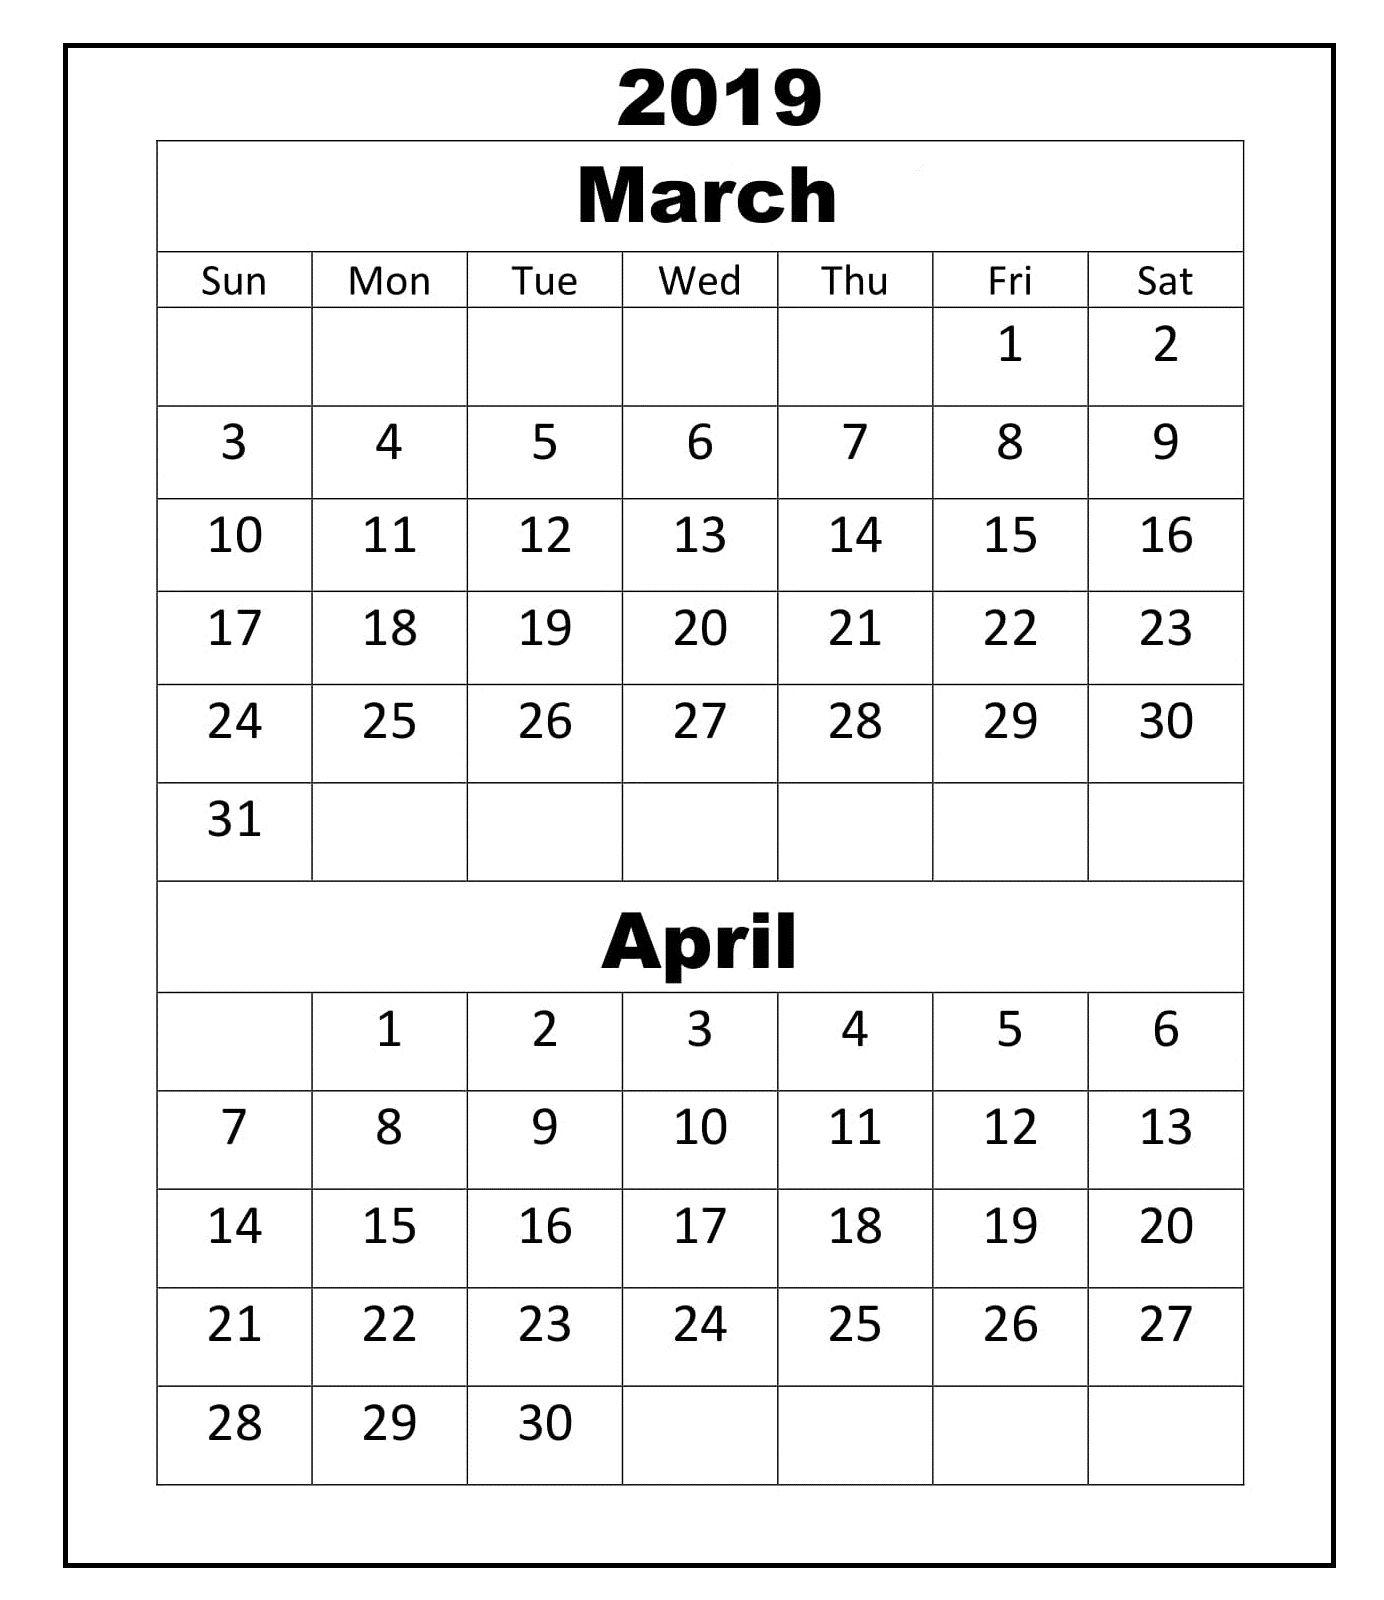 March April 2019 Calendar Academic March April 2019 Calendar For